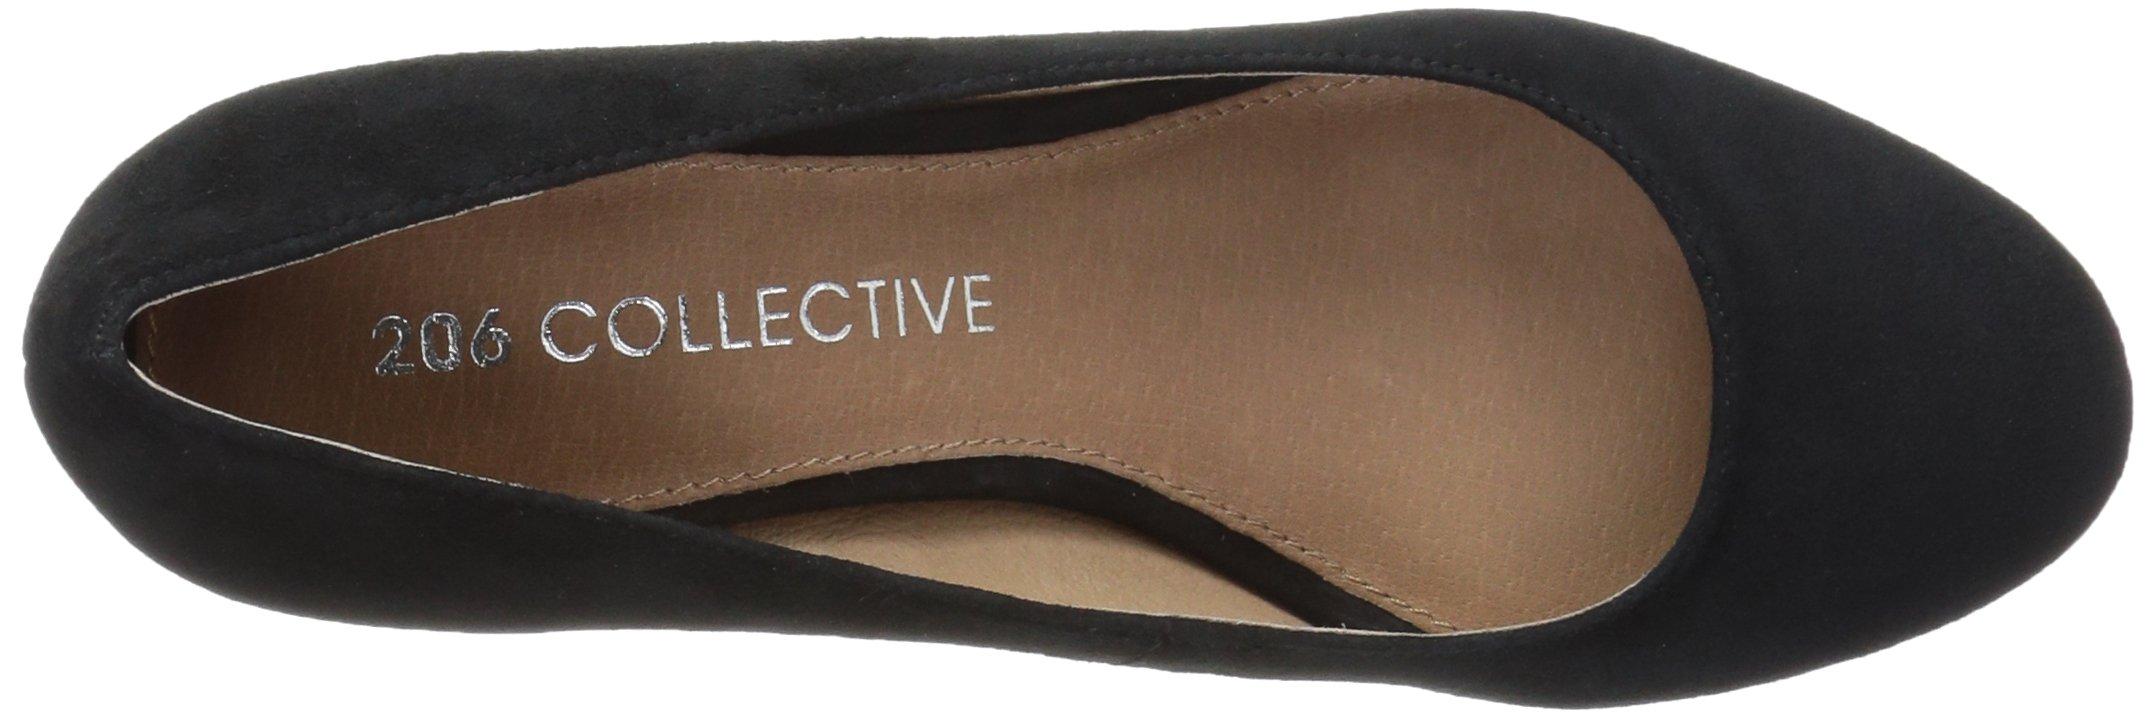 206 Collective Women's Merritt Round Toe Block Heel Low Pump, Black Suede, 7.5 B US by 206 Collective (Image #7)